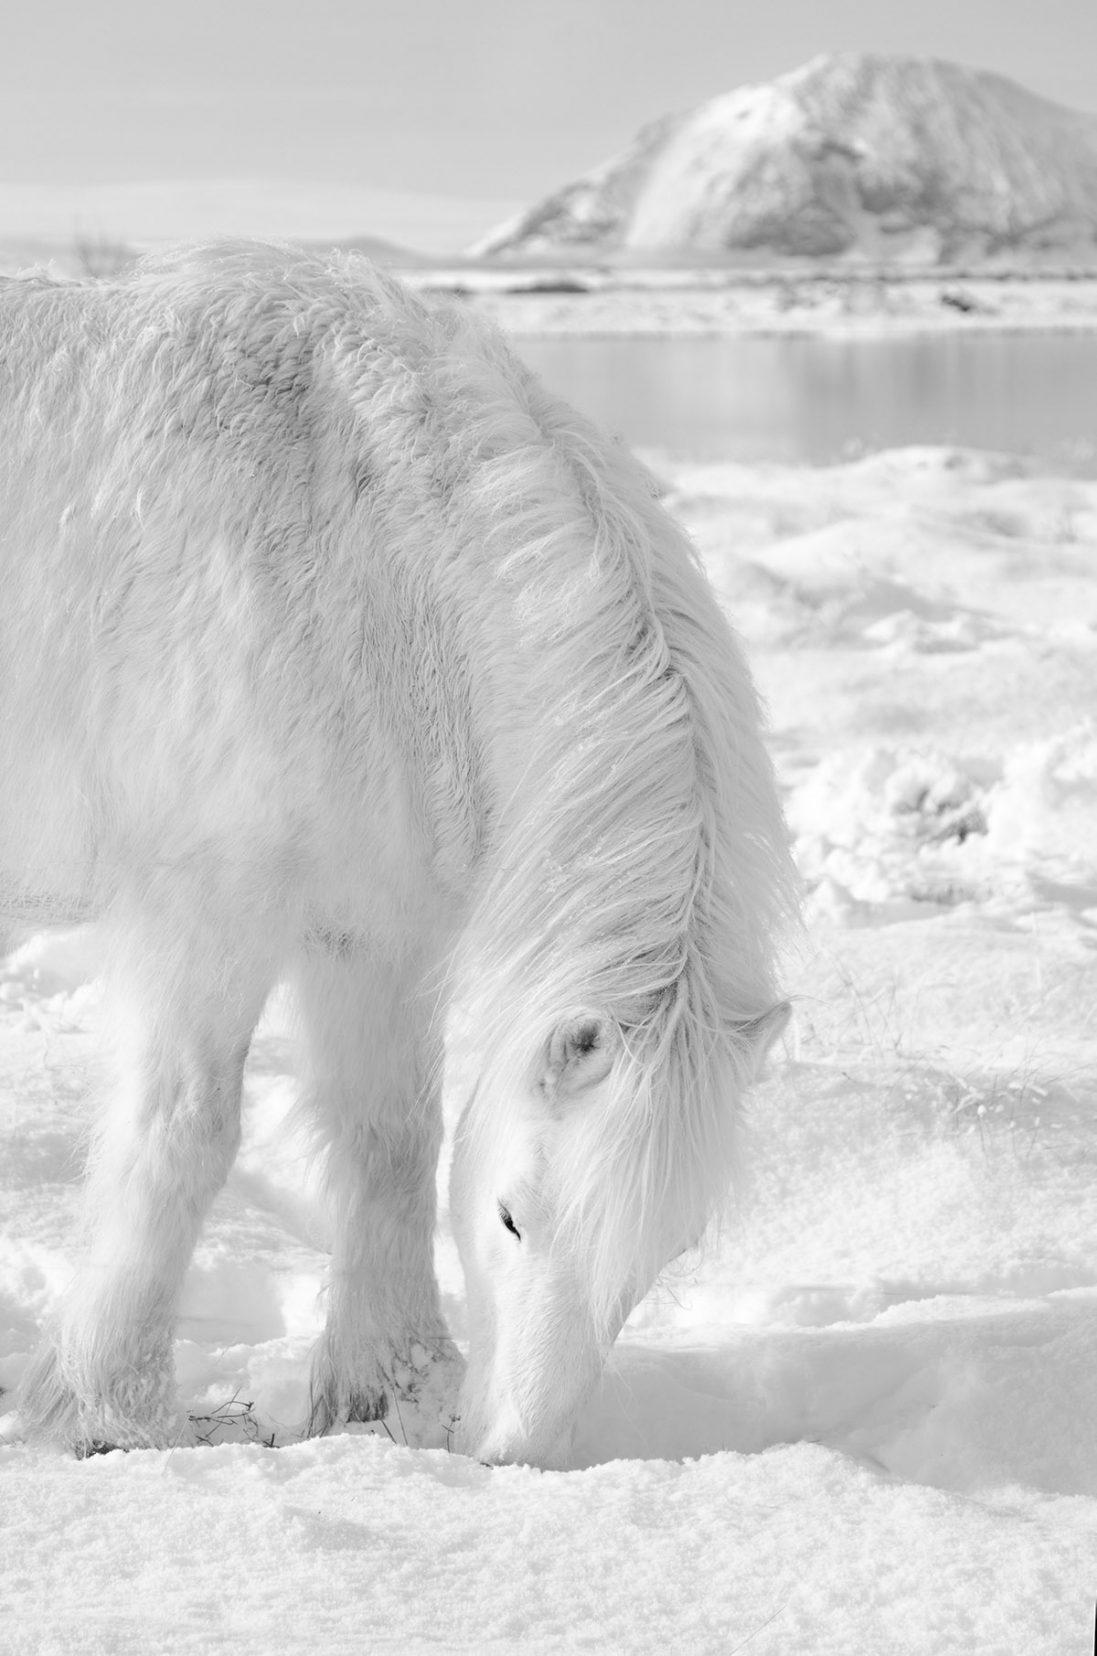 Icelandic-Horse-March-09-2018-15-31-22-Edit.jpg